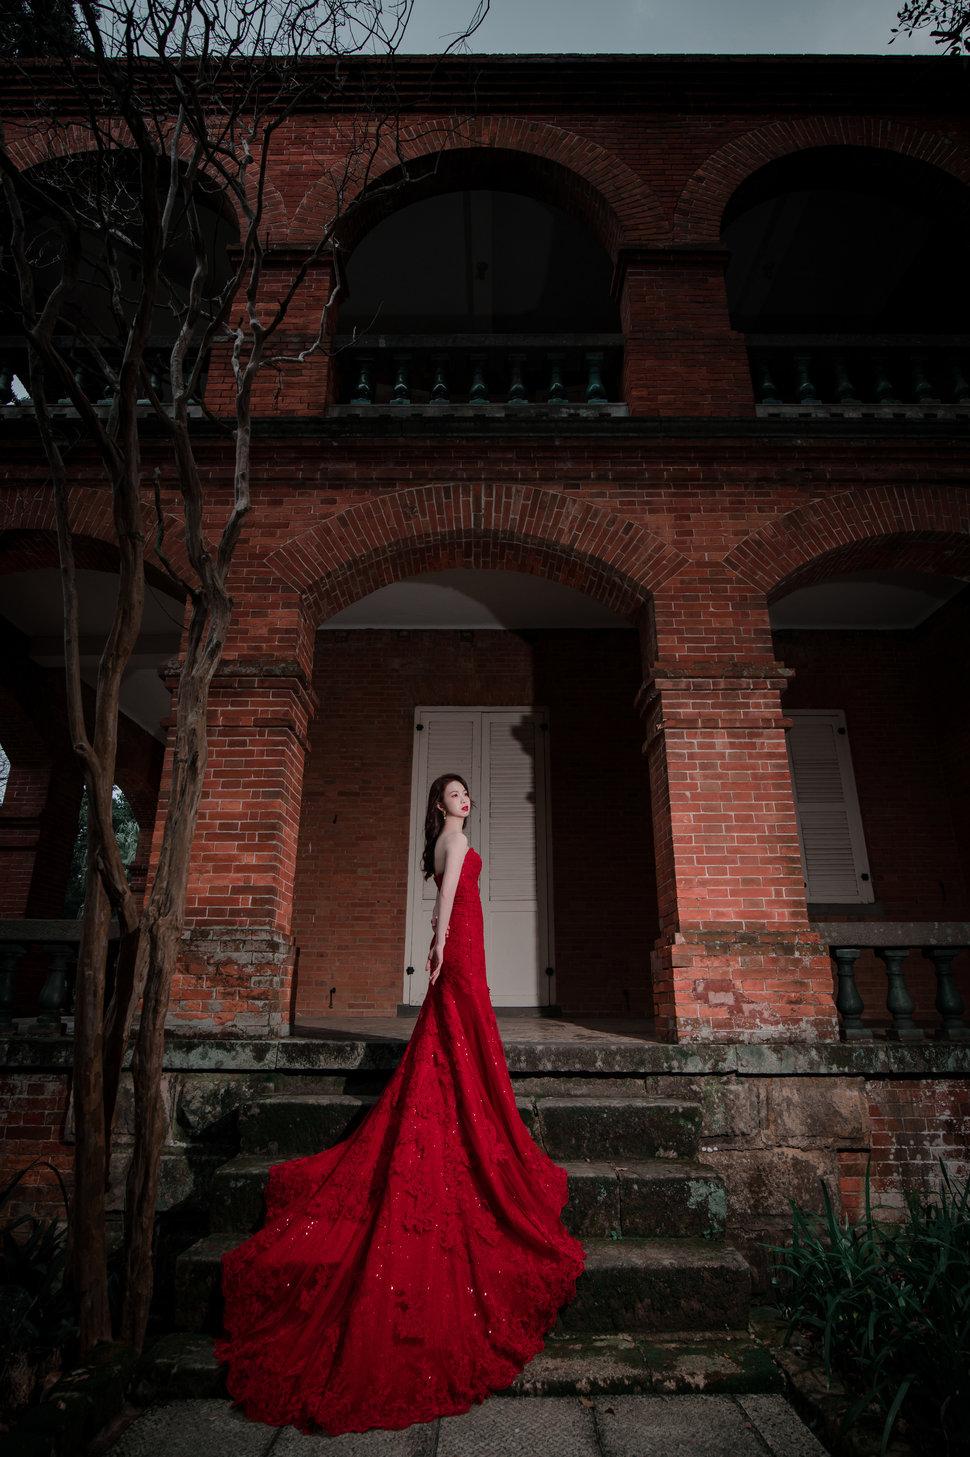 20200111-YEU_5667-1 - 花蓮婚紗 - Sposa Bella《結婚吧》